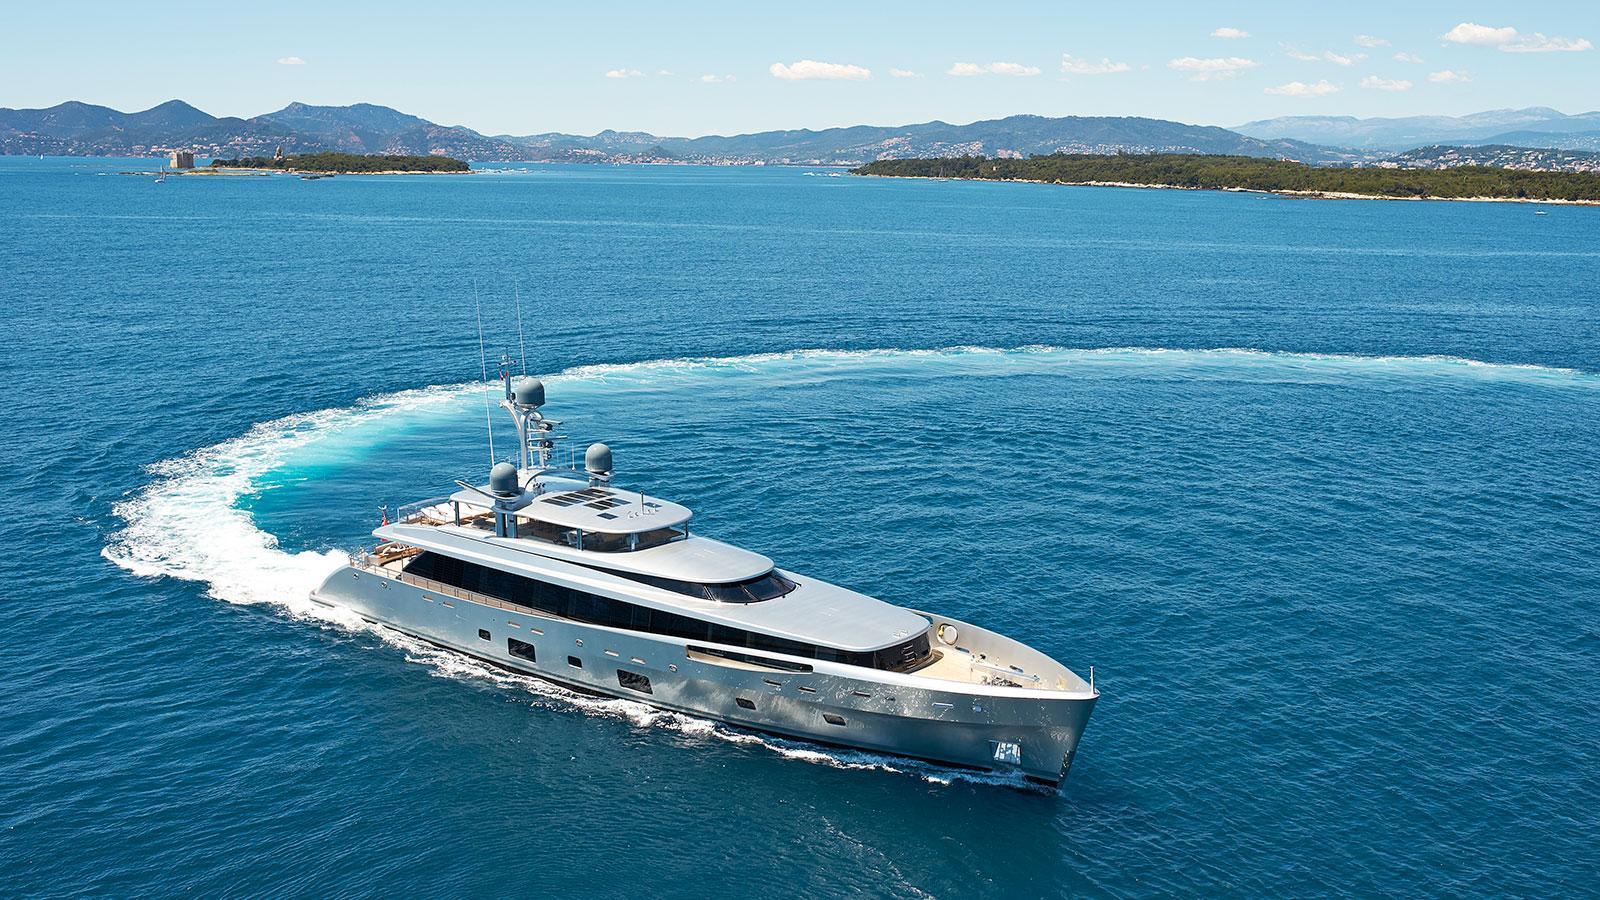 lady-may-motor-yacht-feadship-46m-2014-cruising-turning